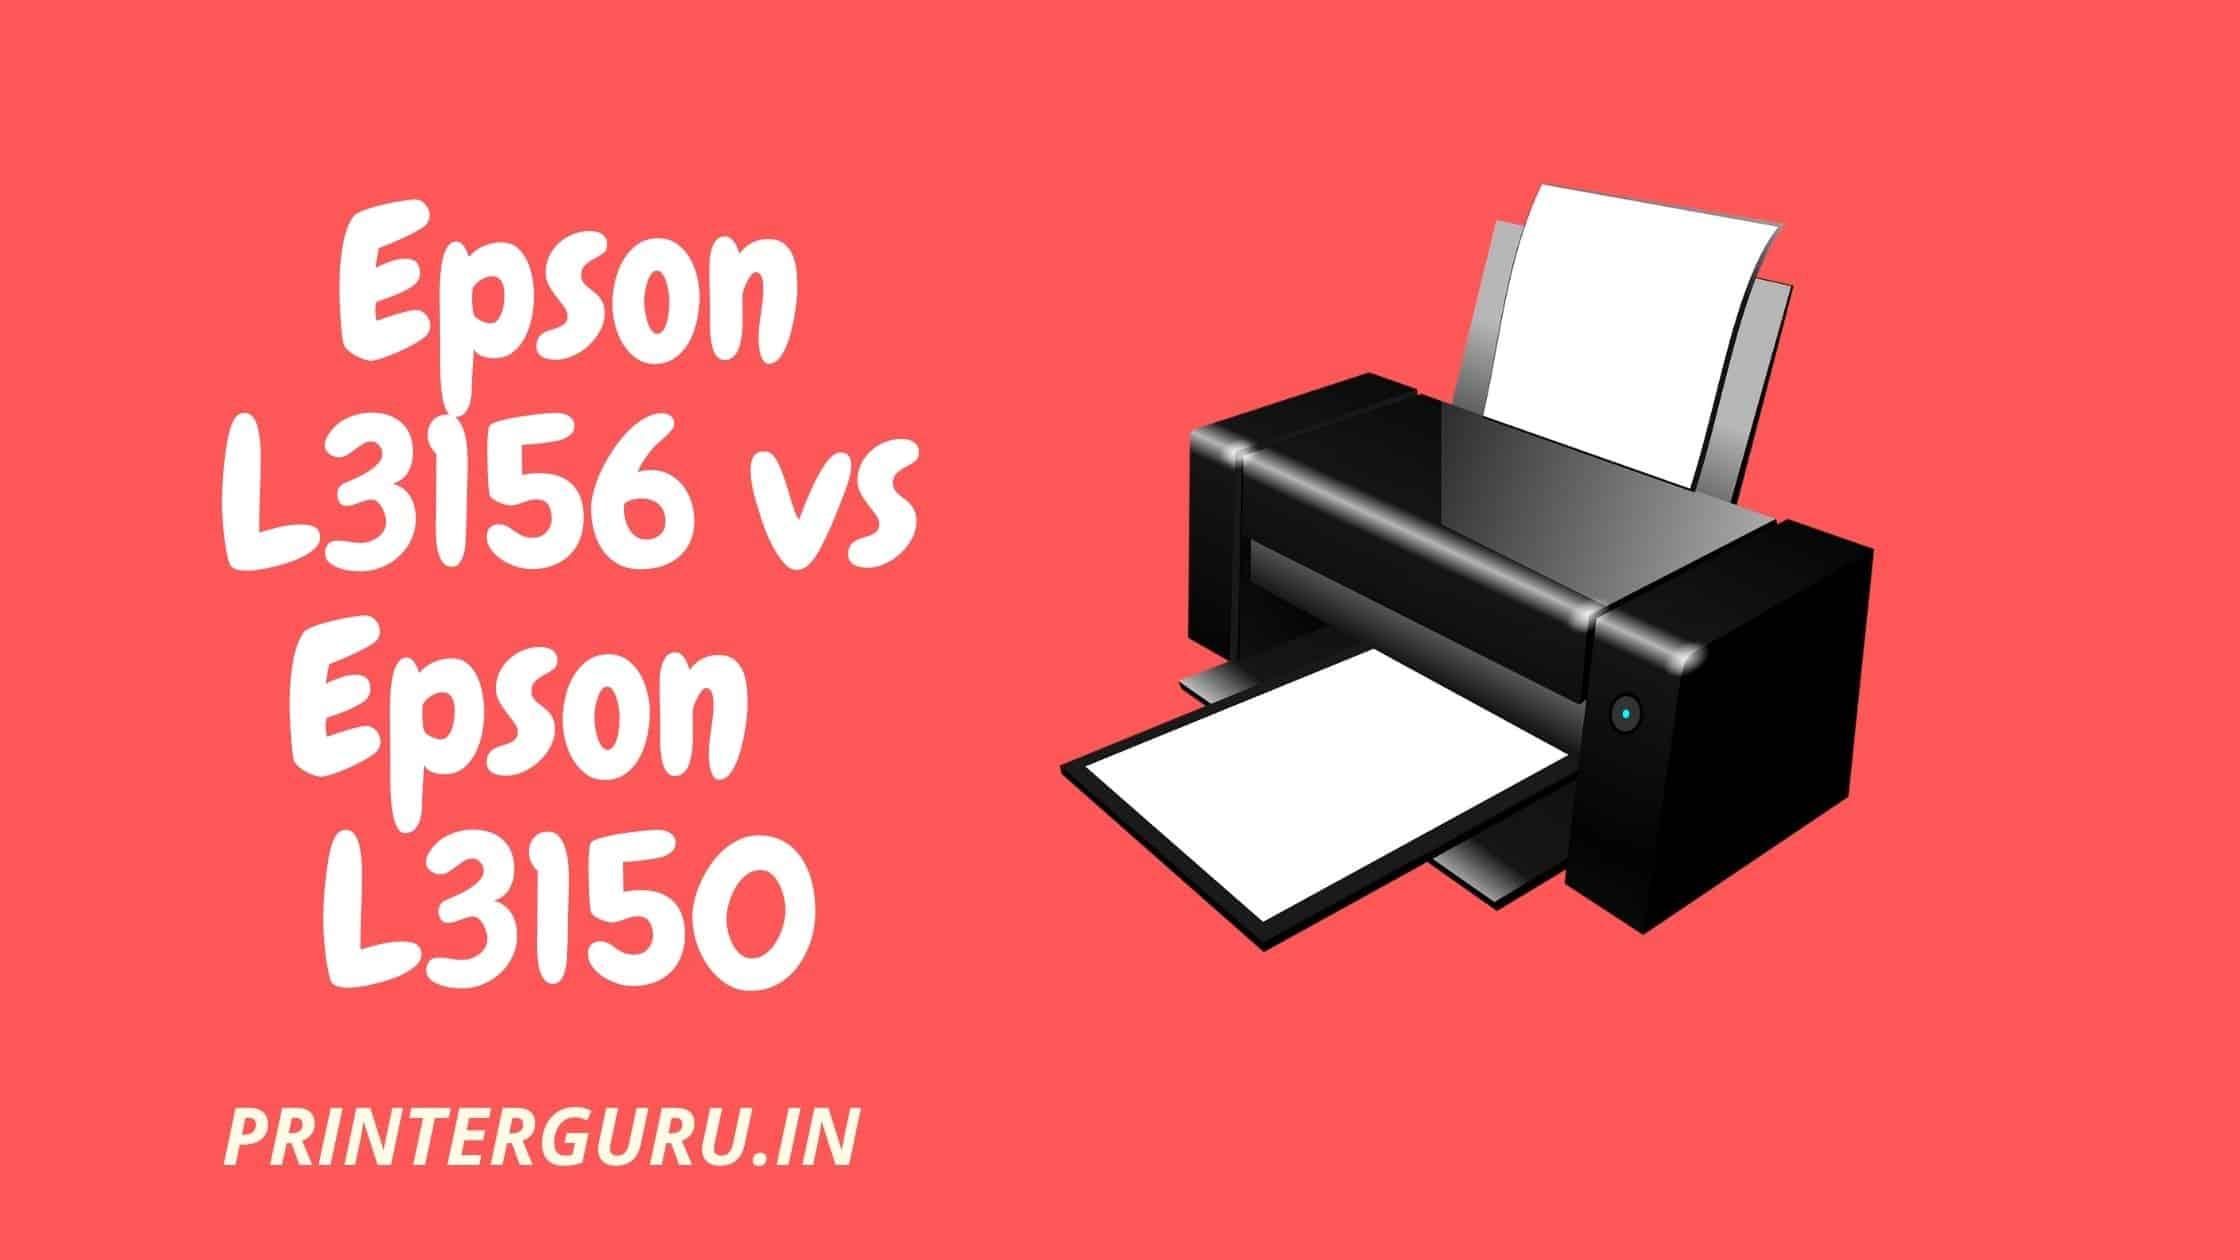 Epson L3156 vs L3150